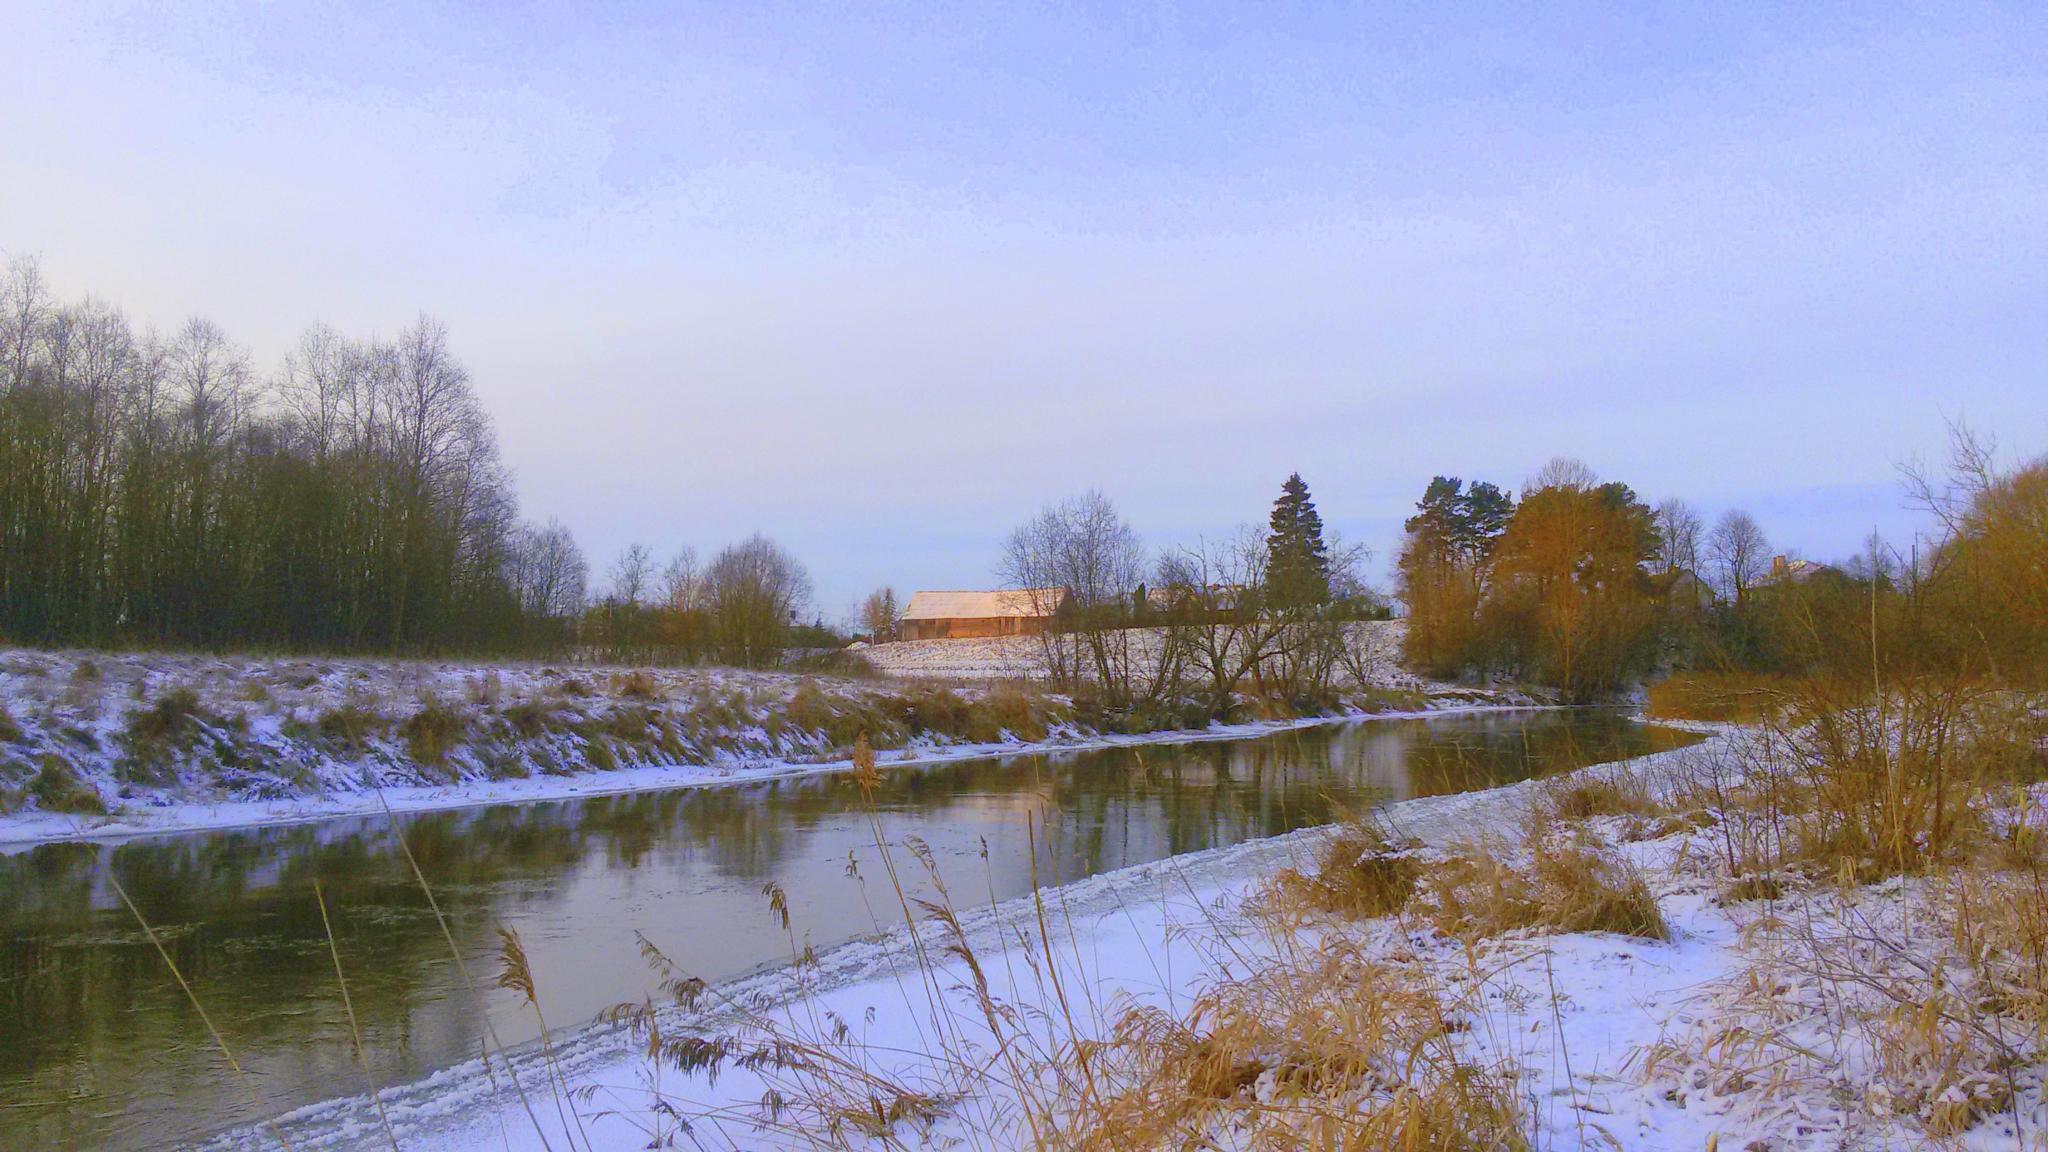 River in winter by Zita Užkuraitienė